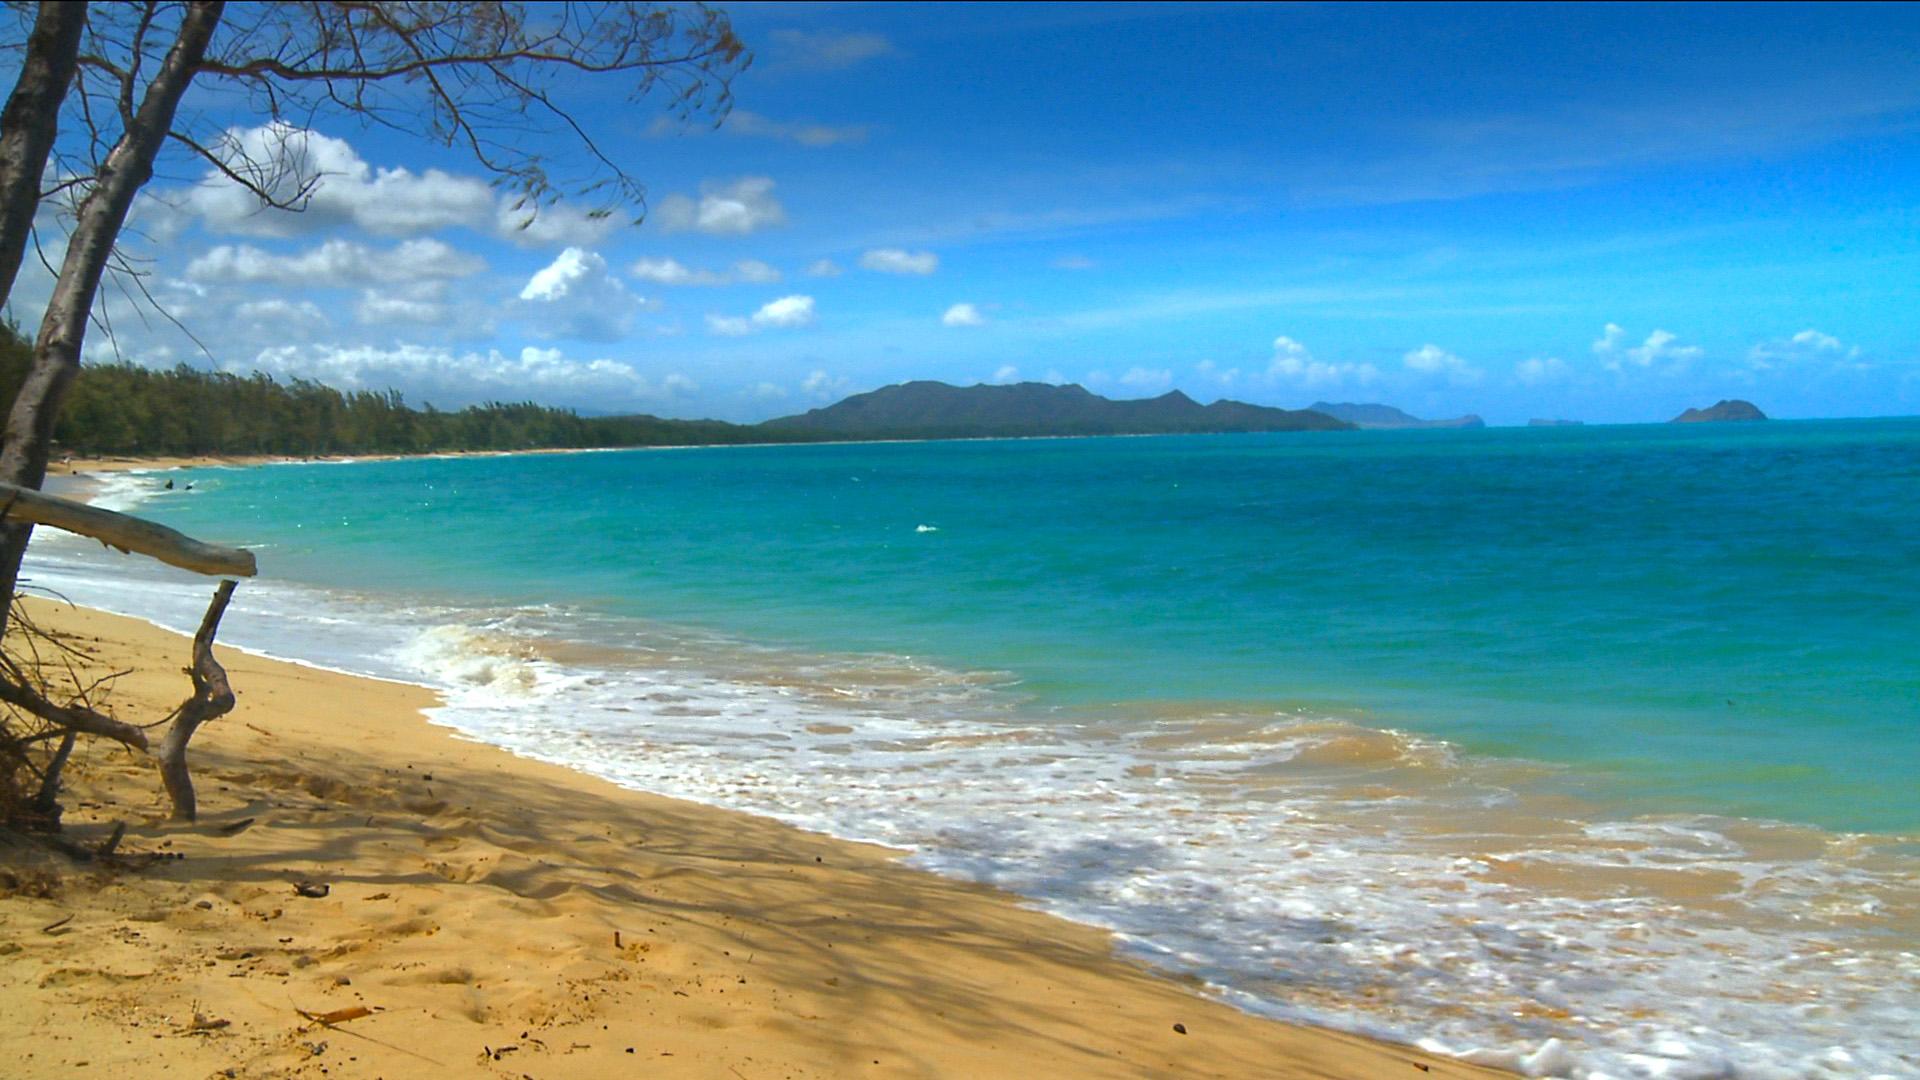 hawaii photos background screensaver beach beaches media 1920x1080